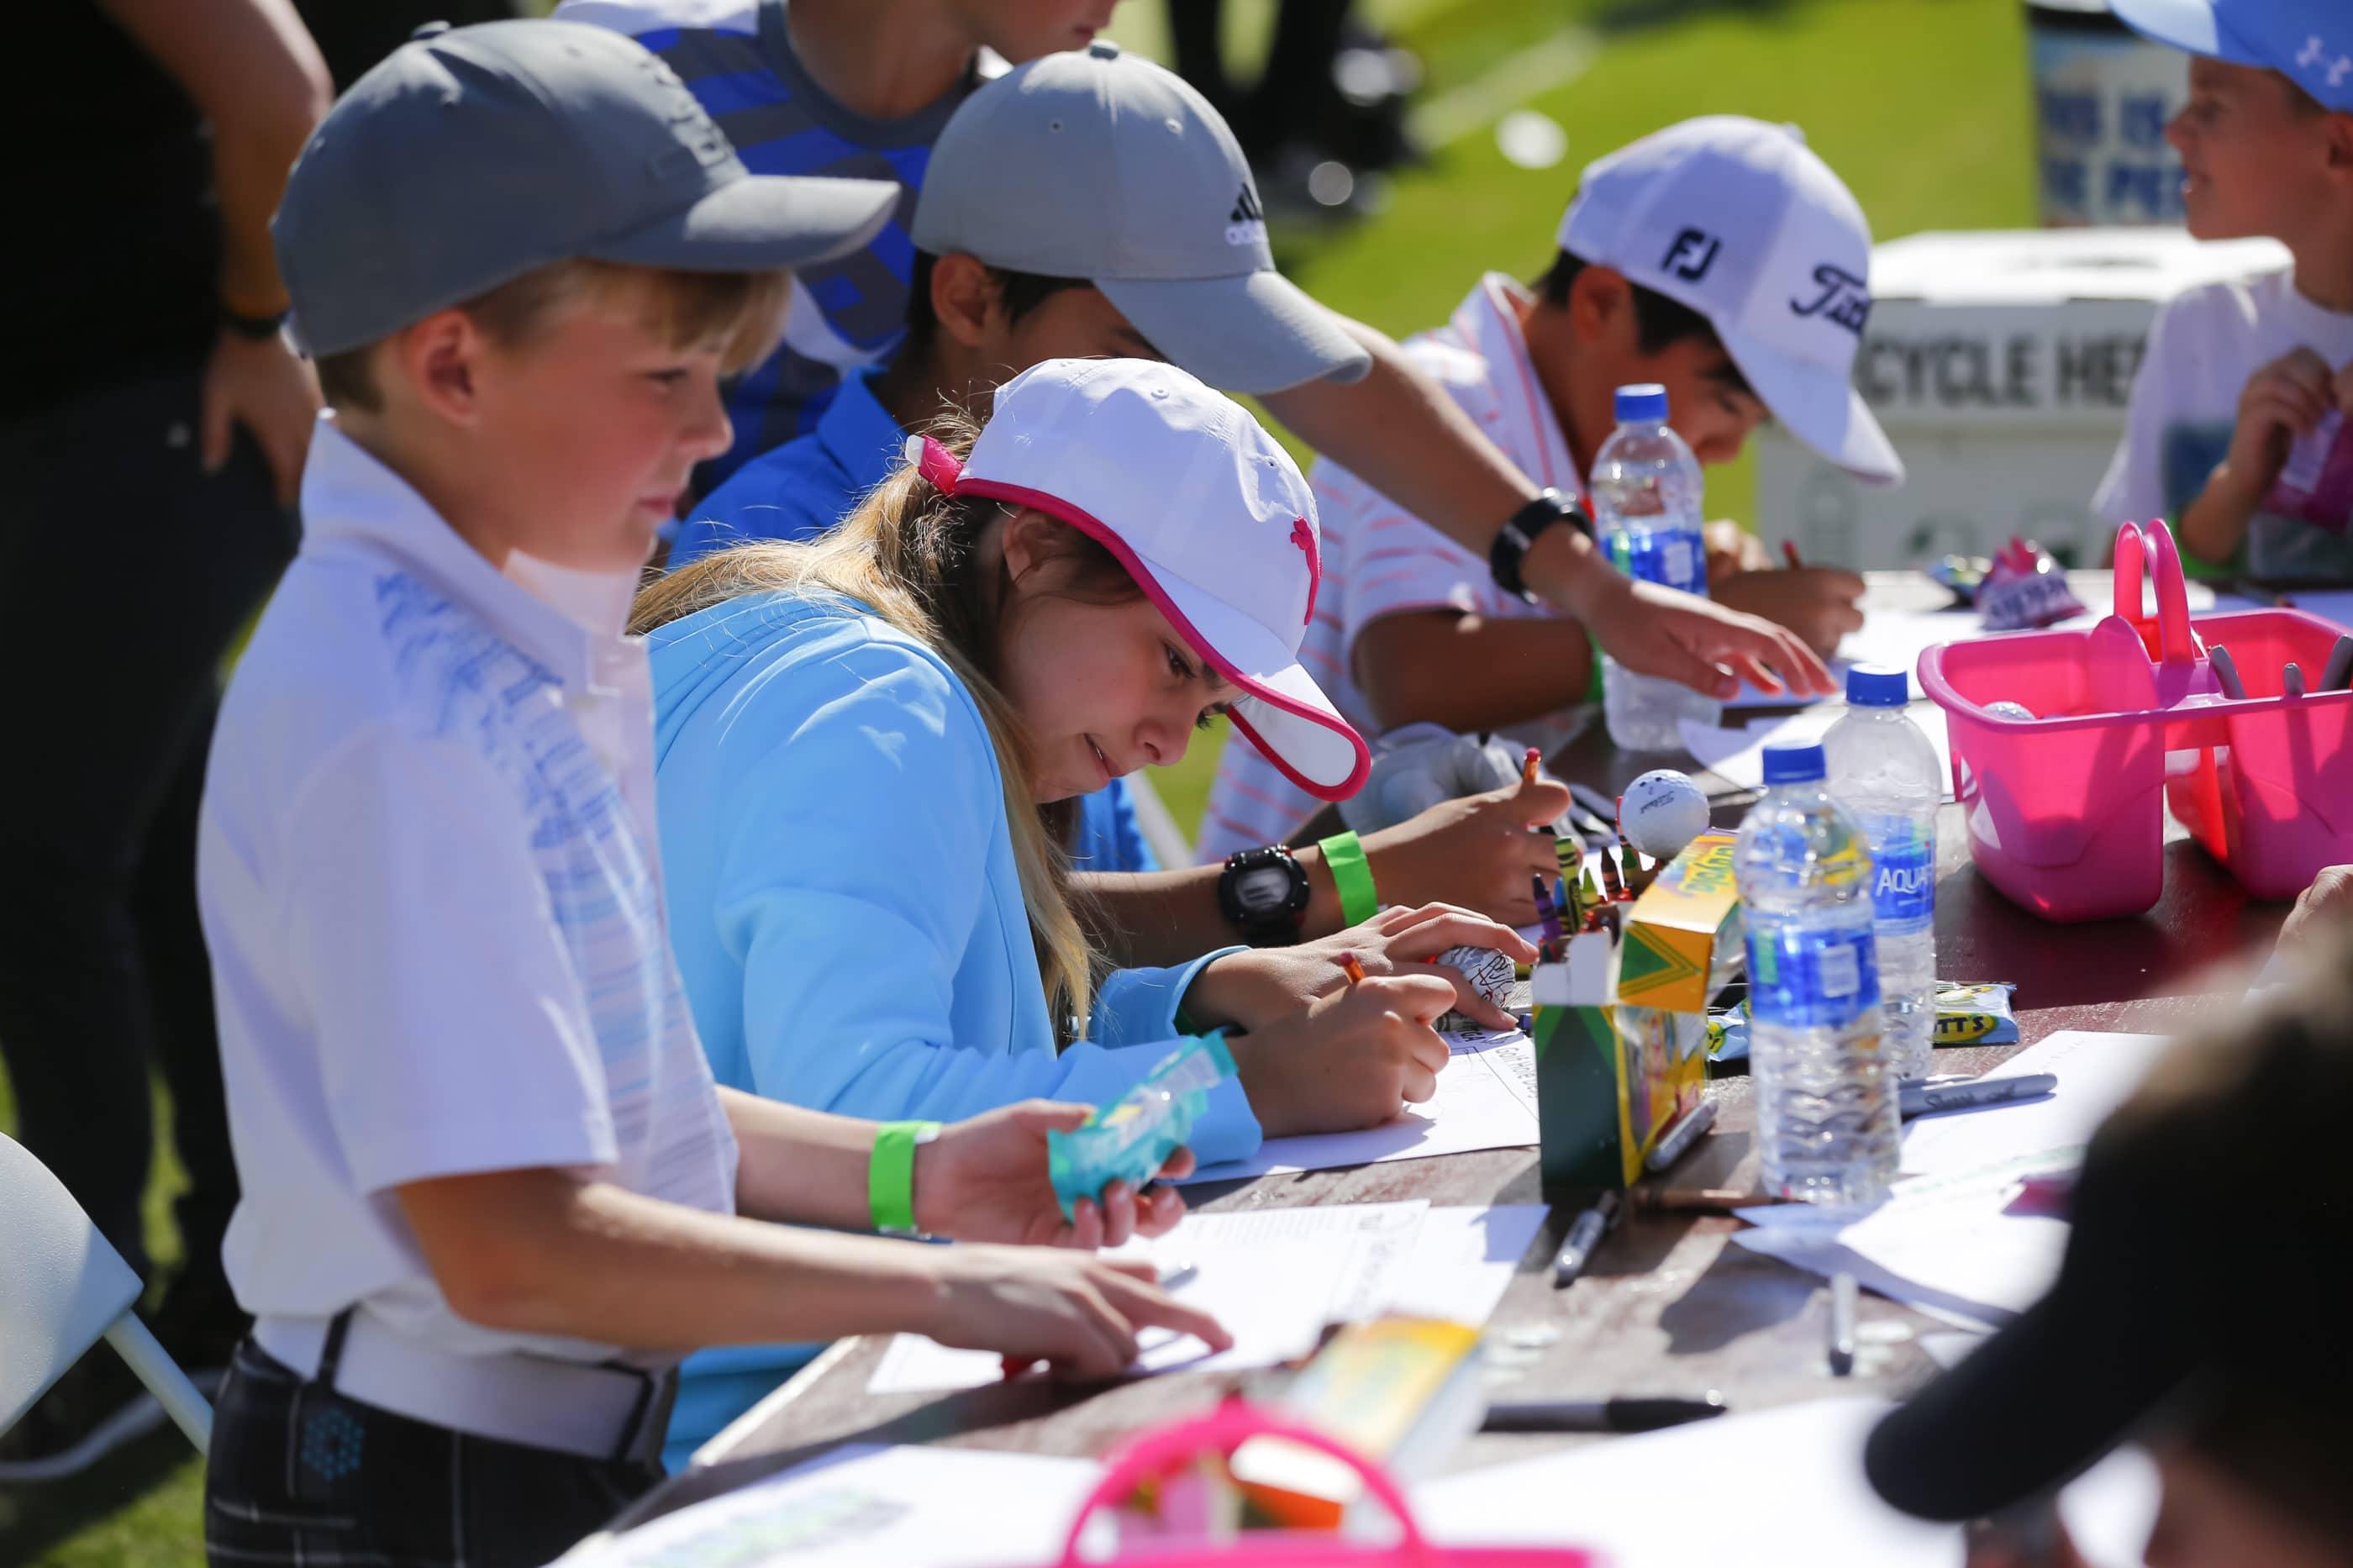 Junior Clinic at the Kia Classic LPGA Golf Tournament in Carlsbad